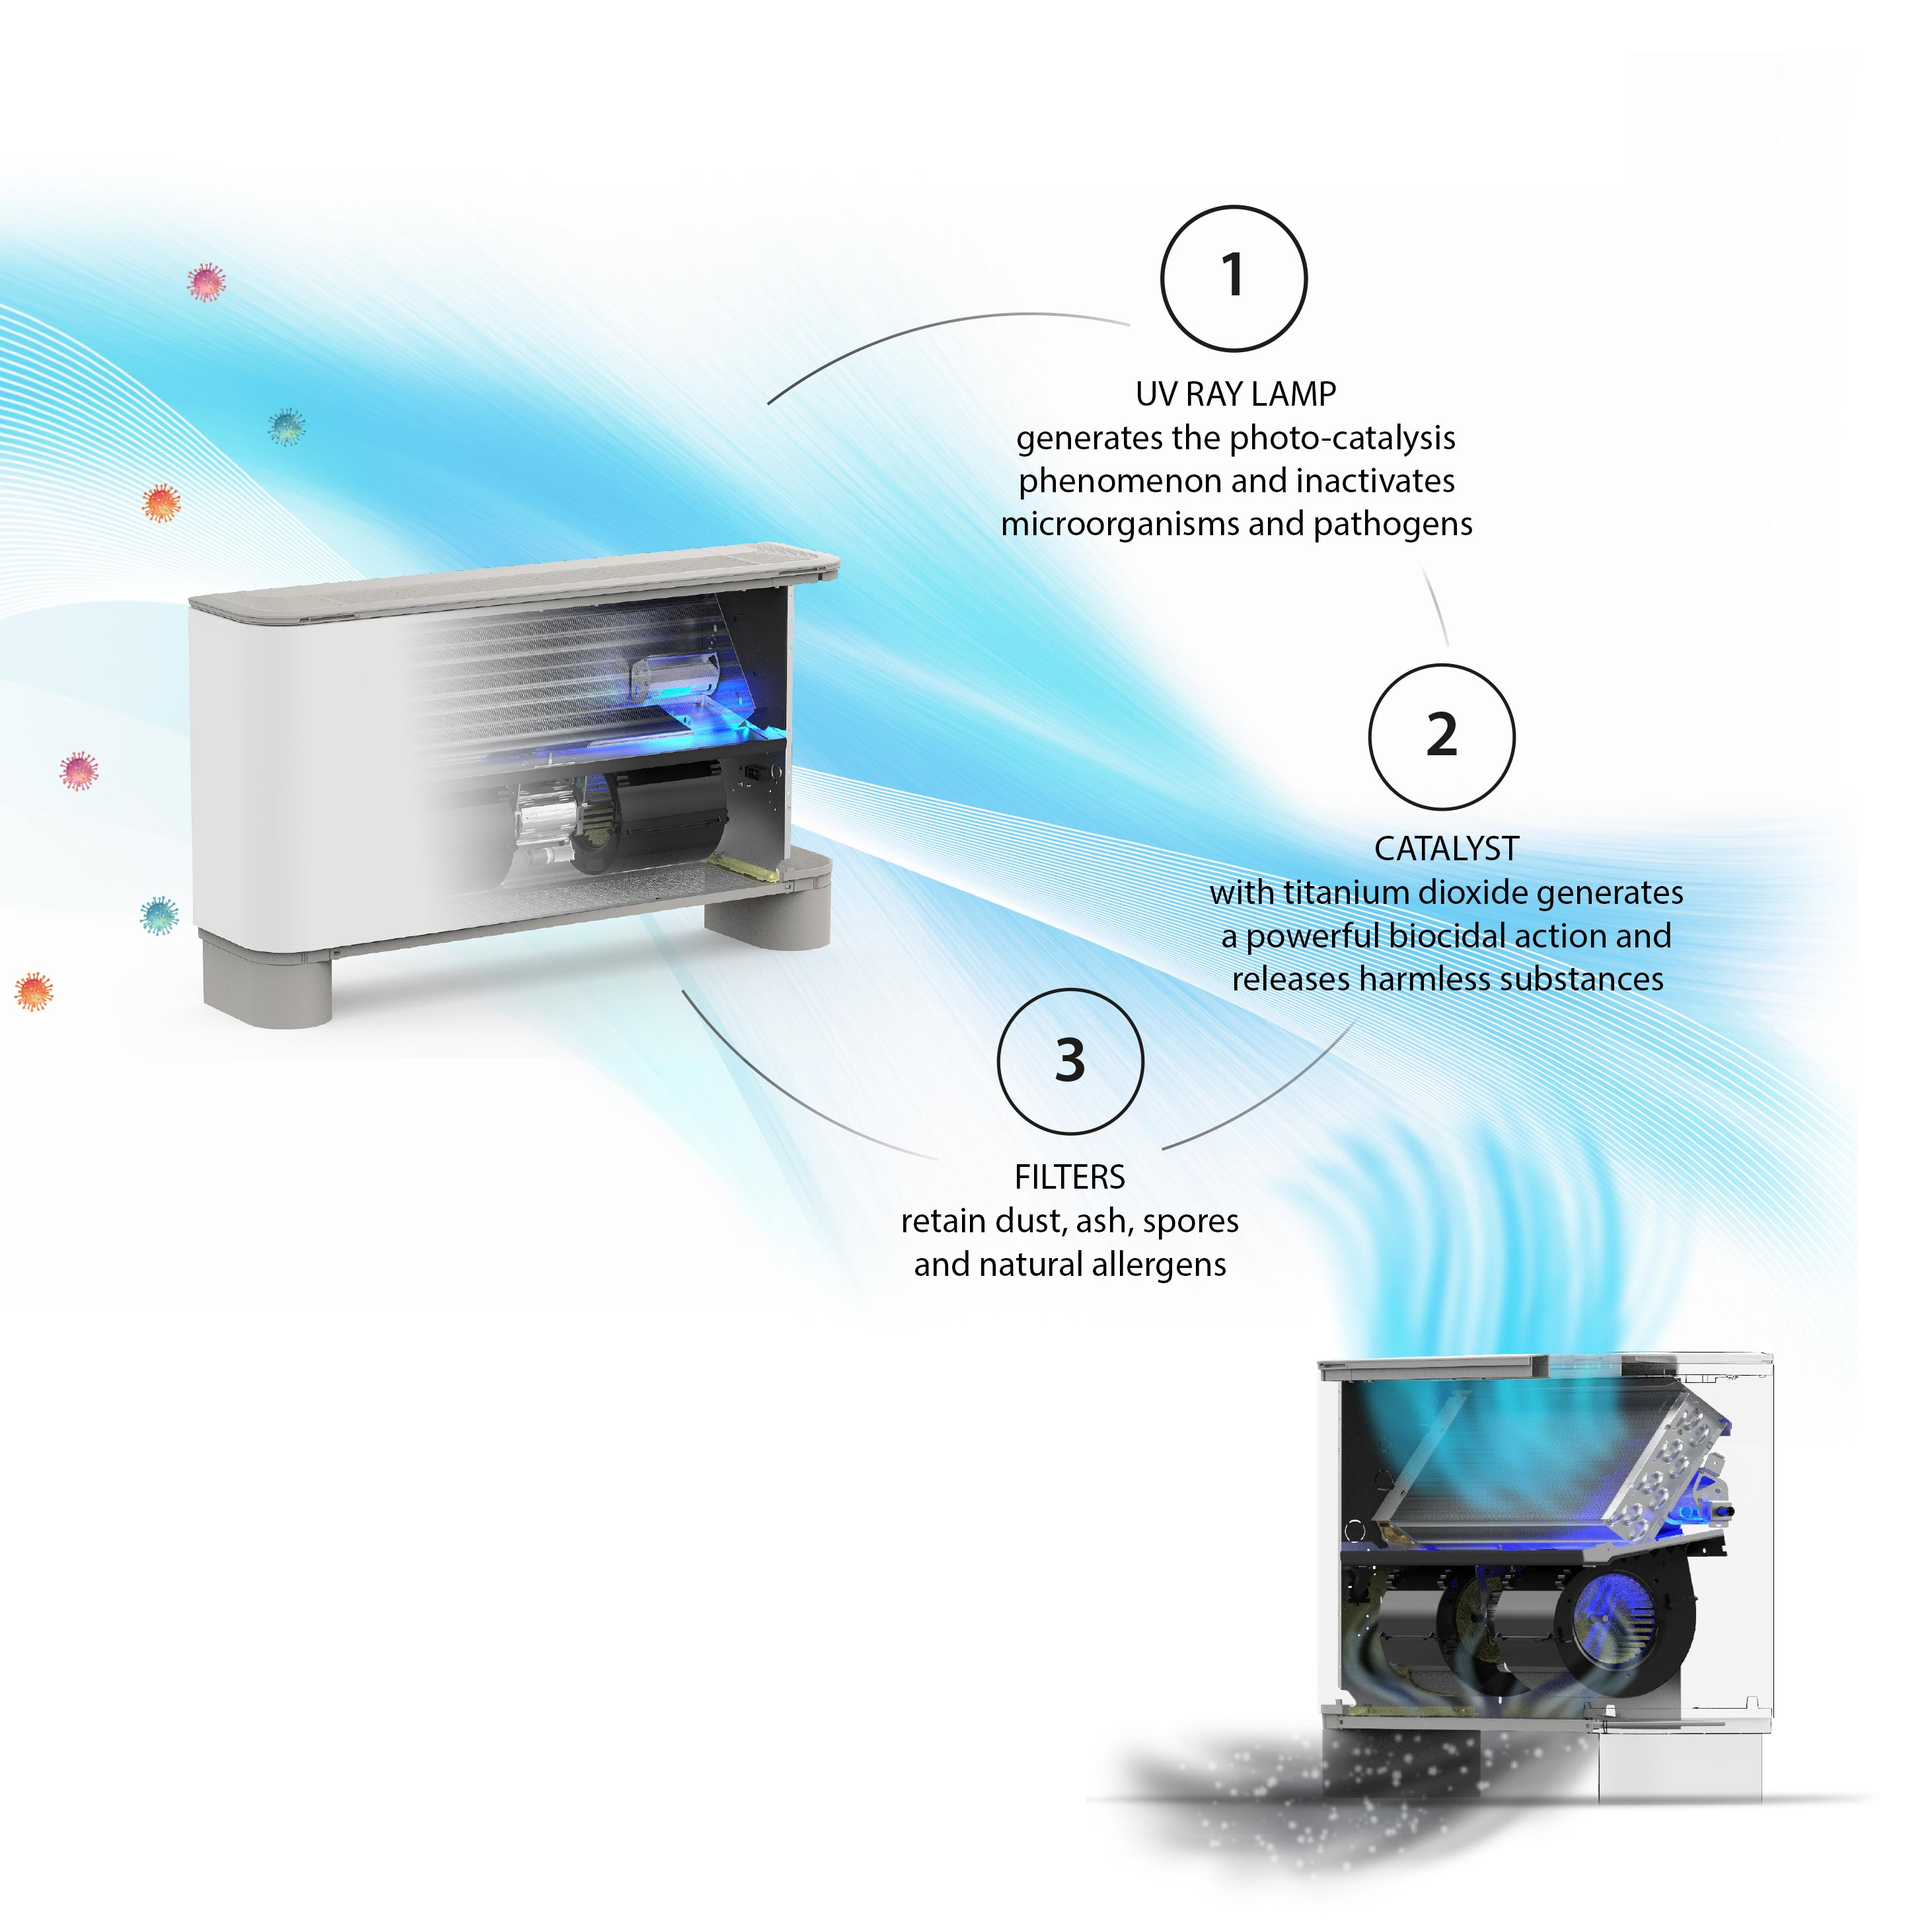 Aermec - Photo-catalytic technology